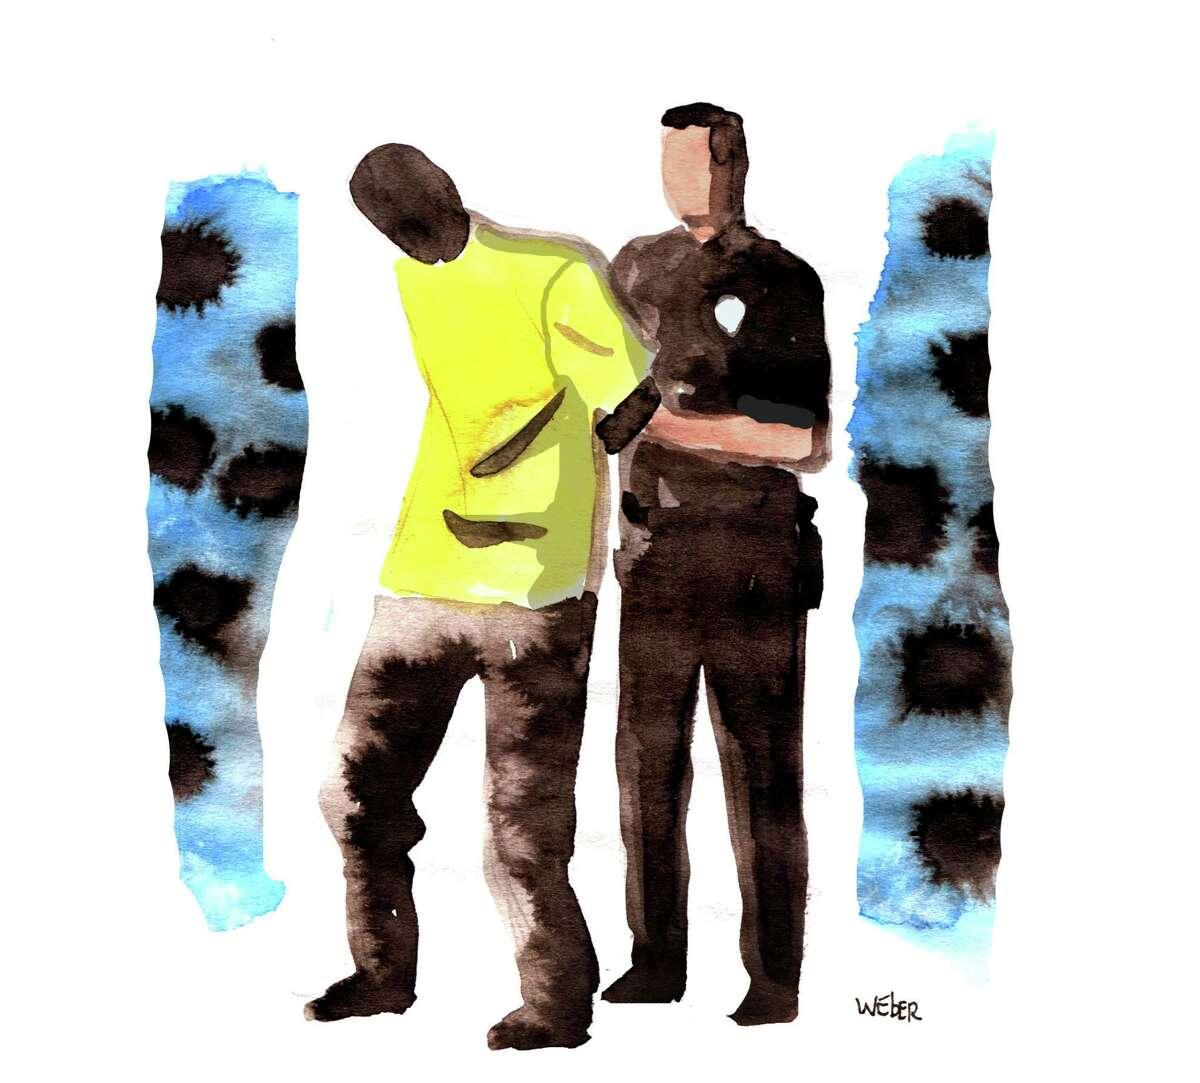 Racial profiling illustration